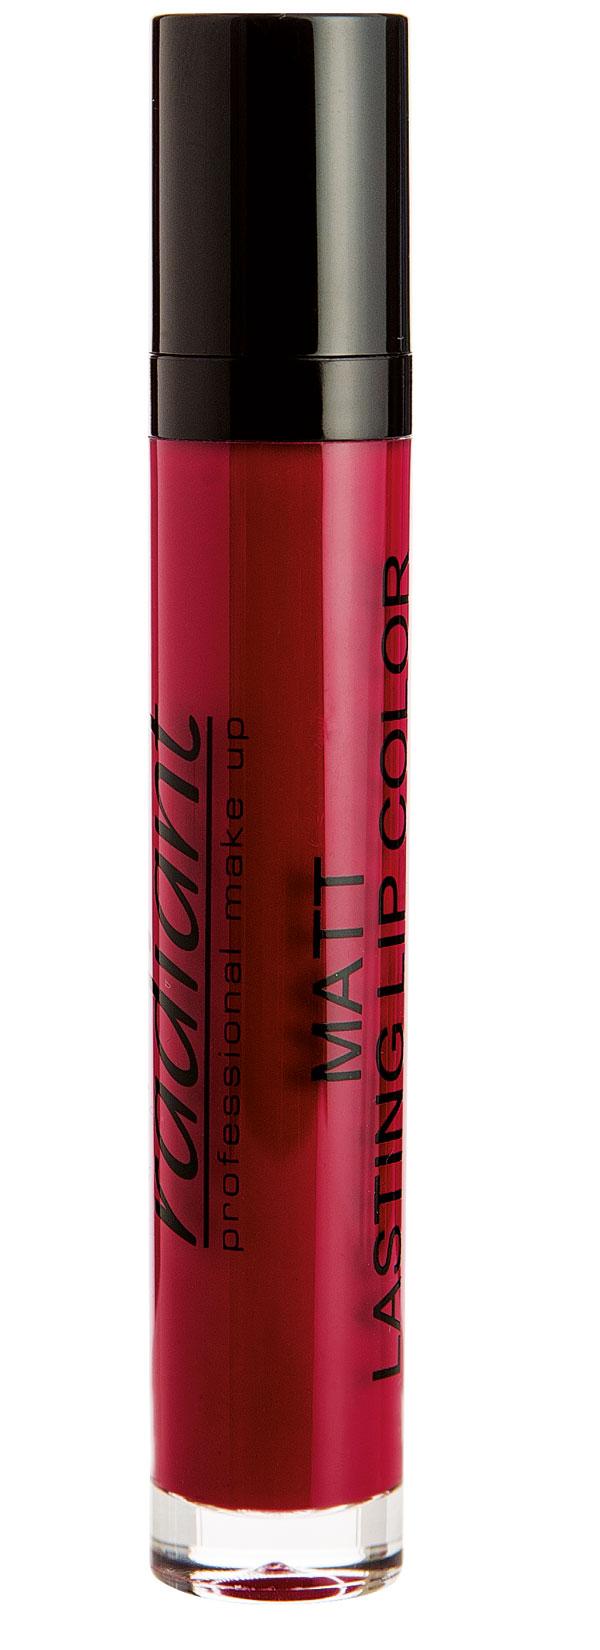 matt_lasting_lip_color_18ne